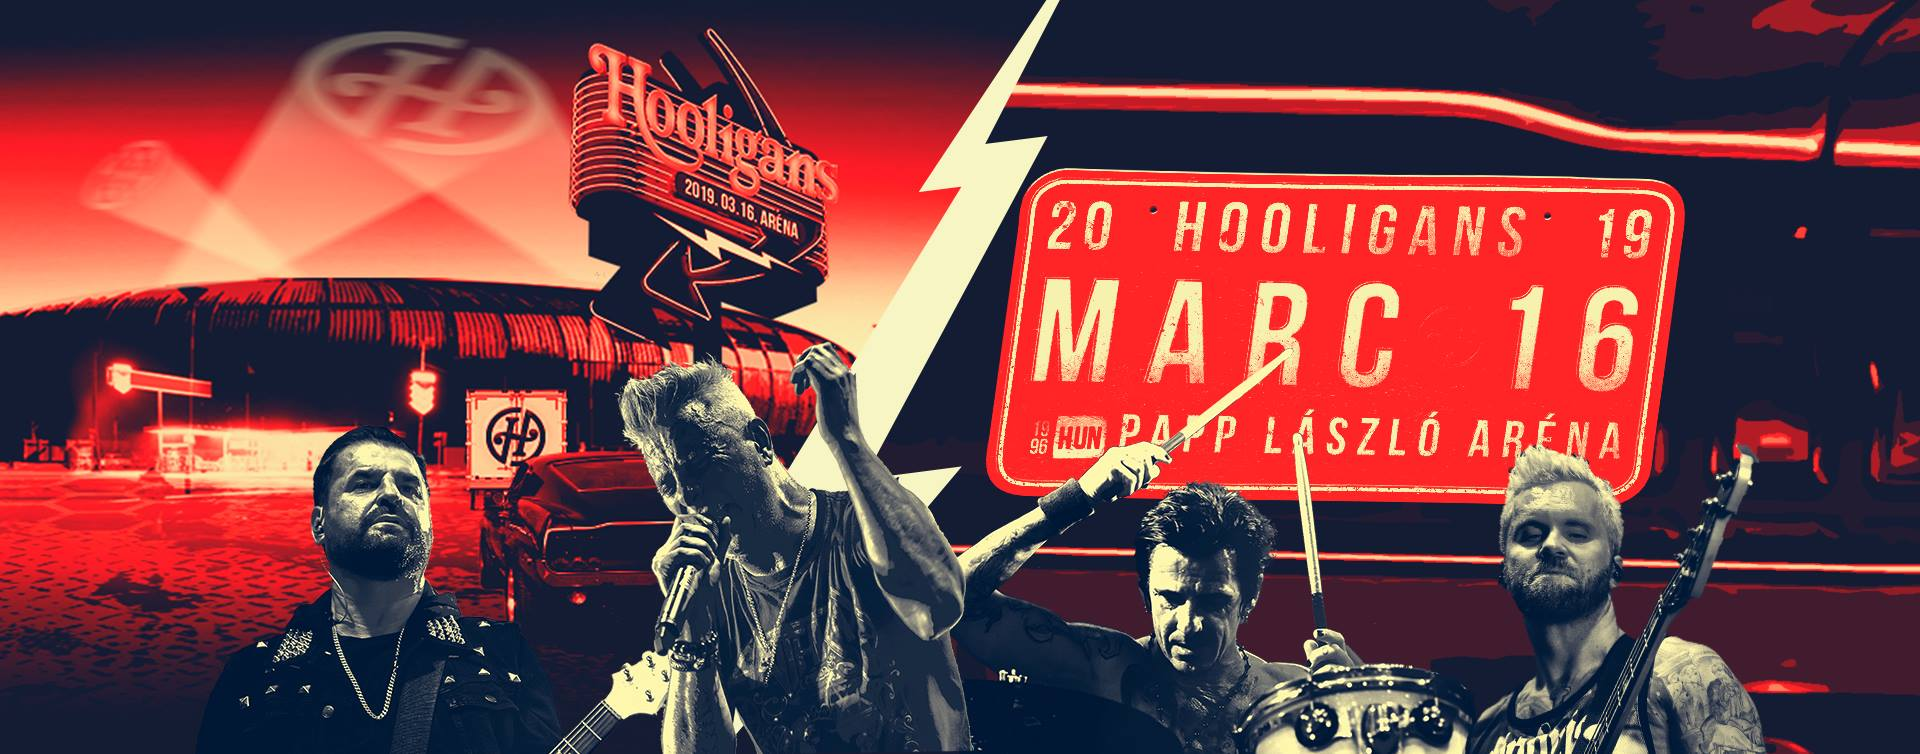 Hooligans koncert 2019 - Budapest Aréna